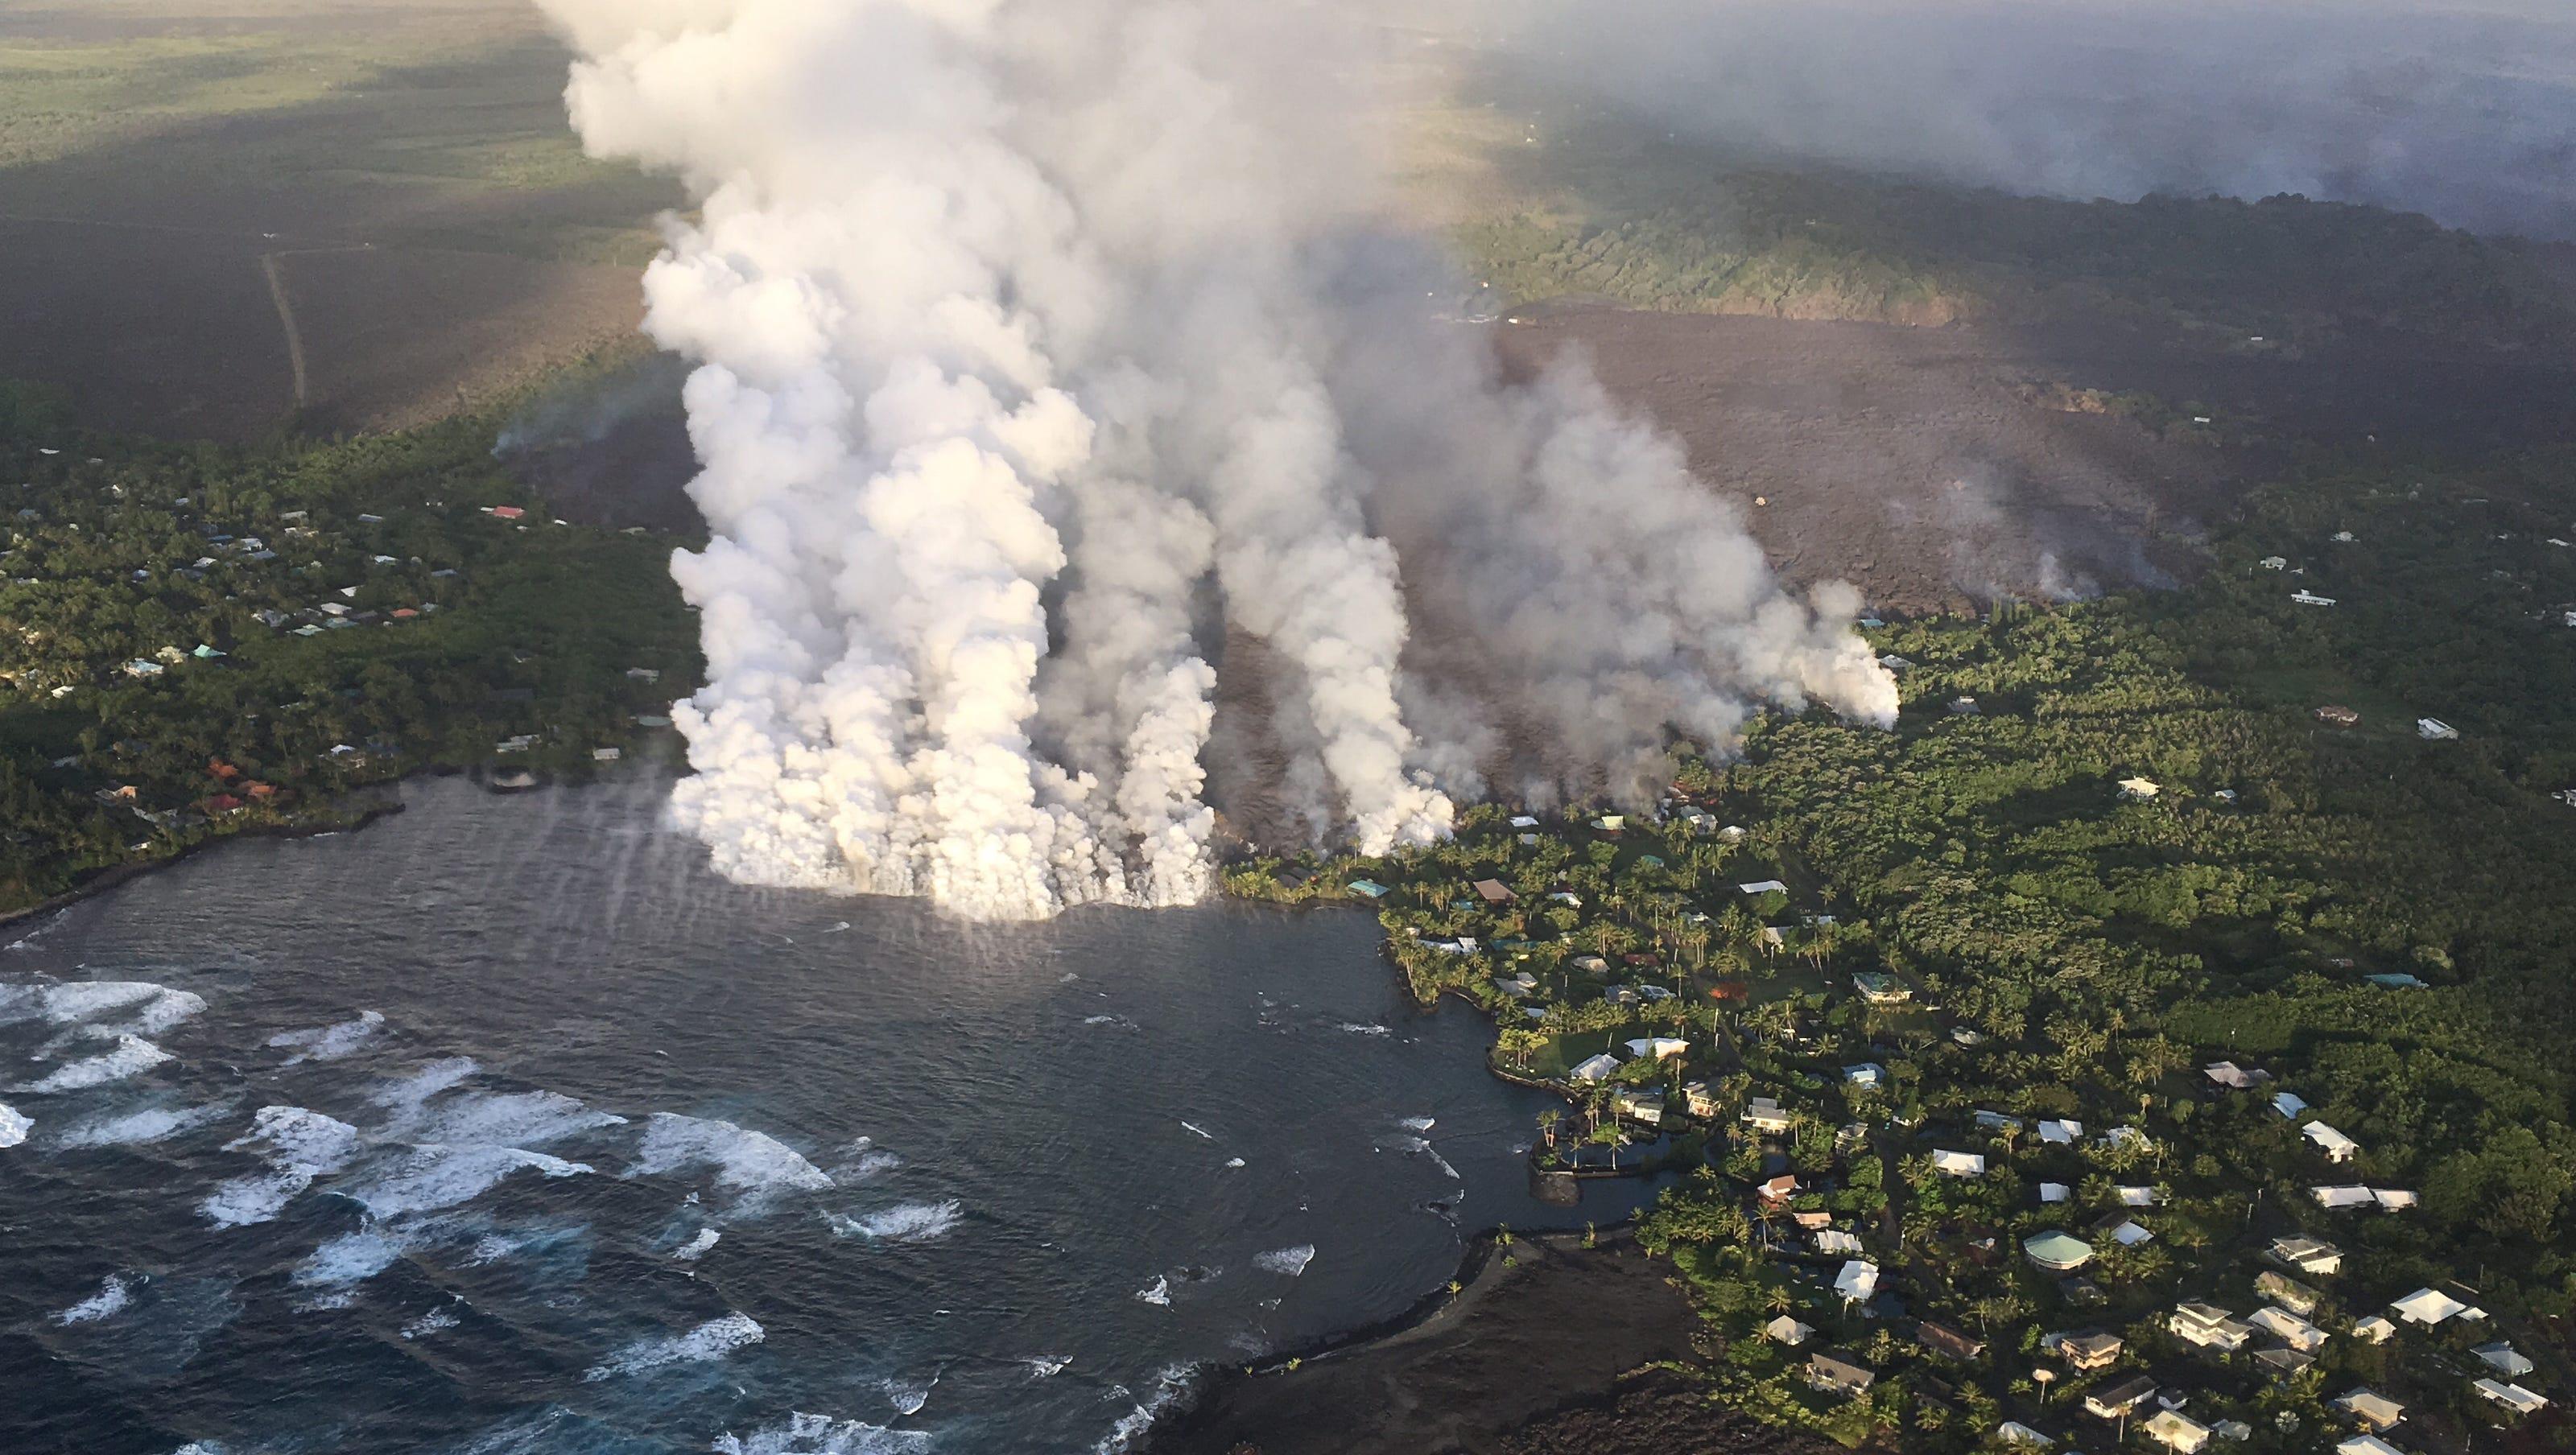 Hawaii Volcano Hundreds More Homes Destroyed Including